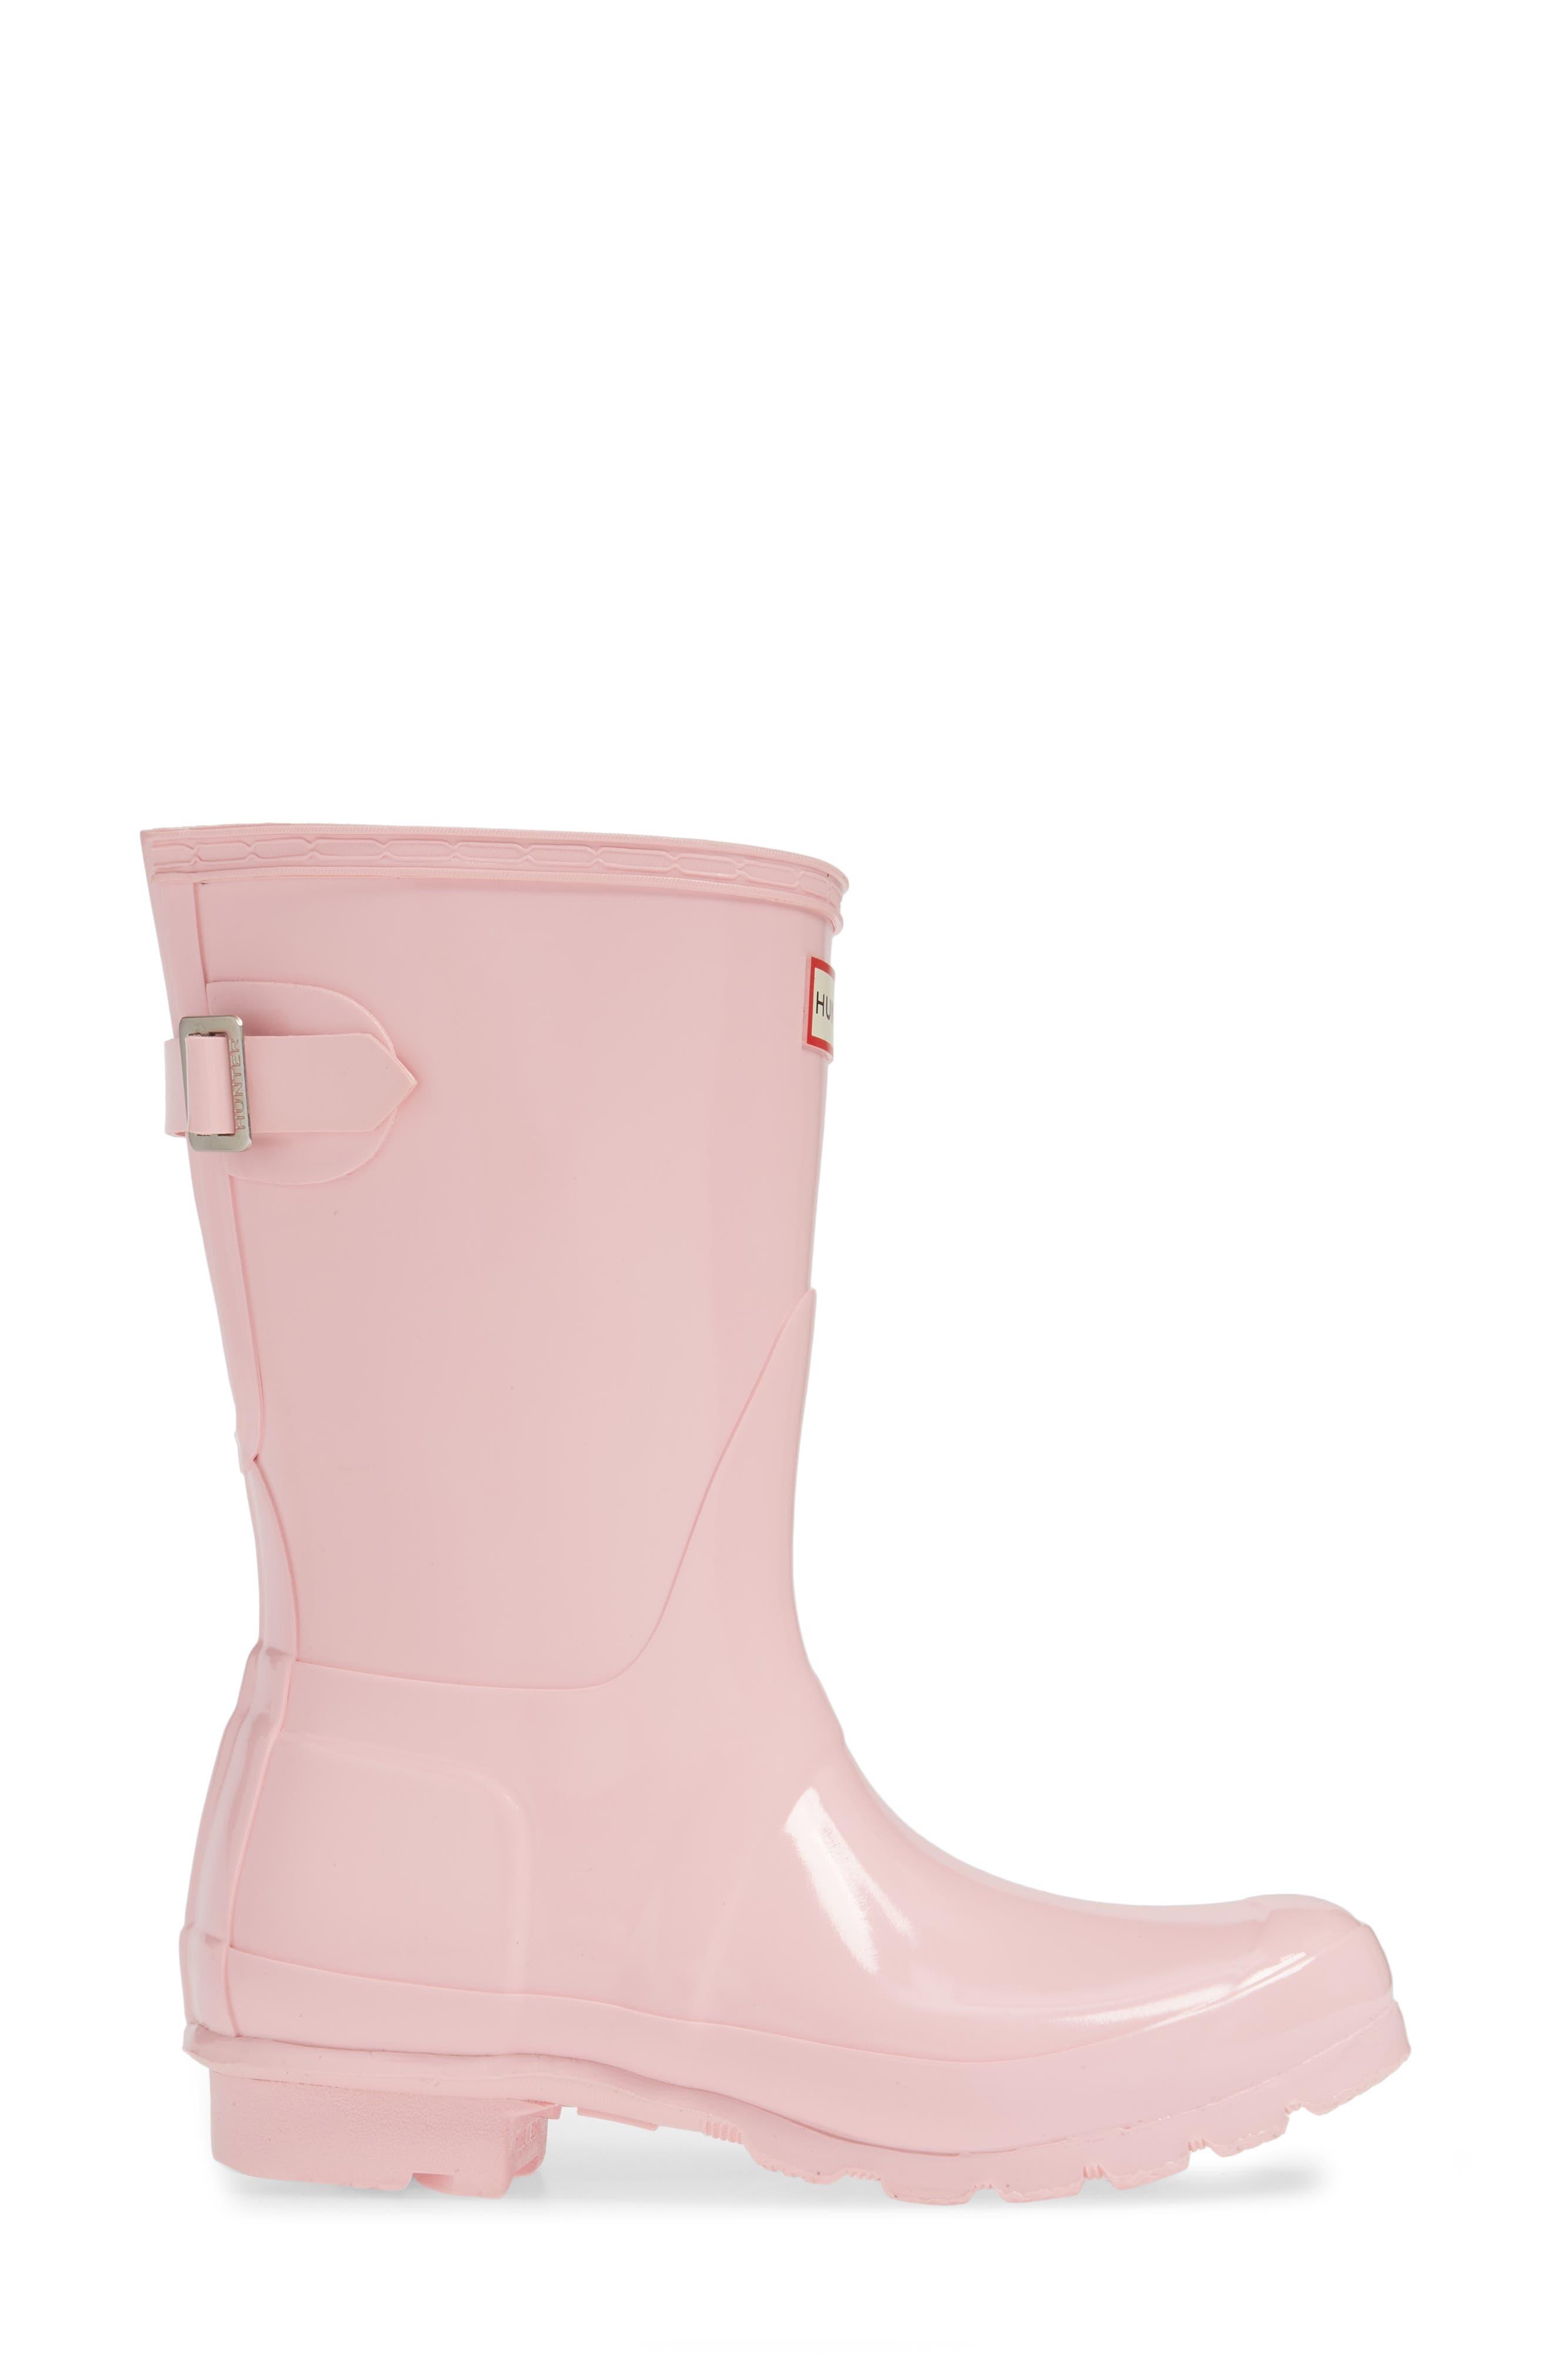 HUNTER,                             Original Short Adjustable Back Gloss Waterproof Rain Boot,                             Alternate thumbnail 3, color,                             CANDY FLOSS RUBBER